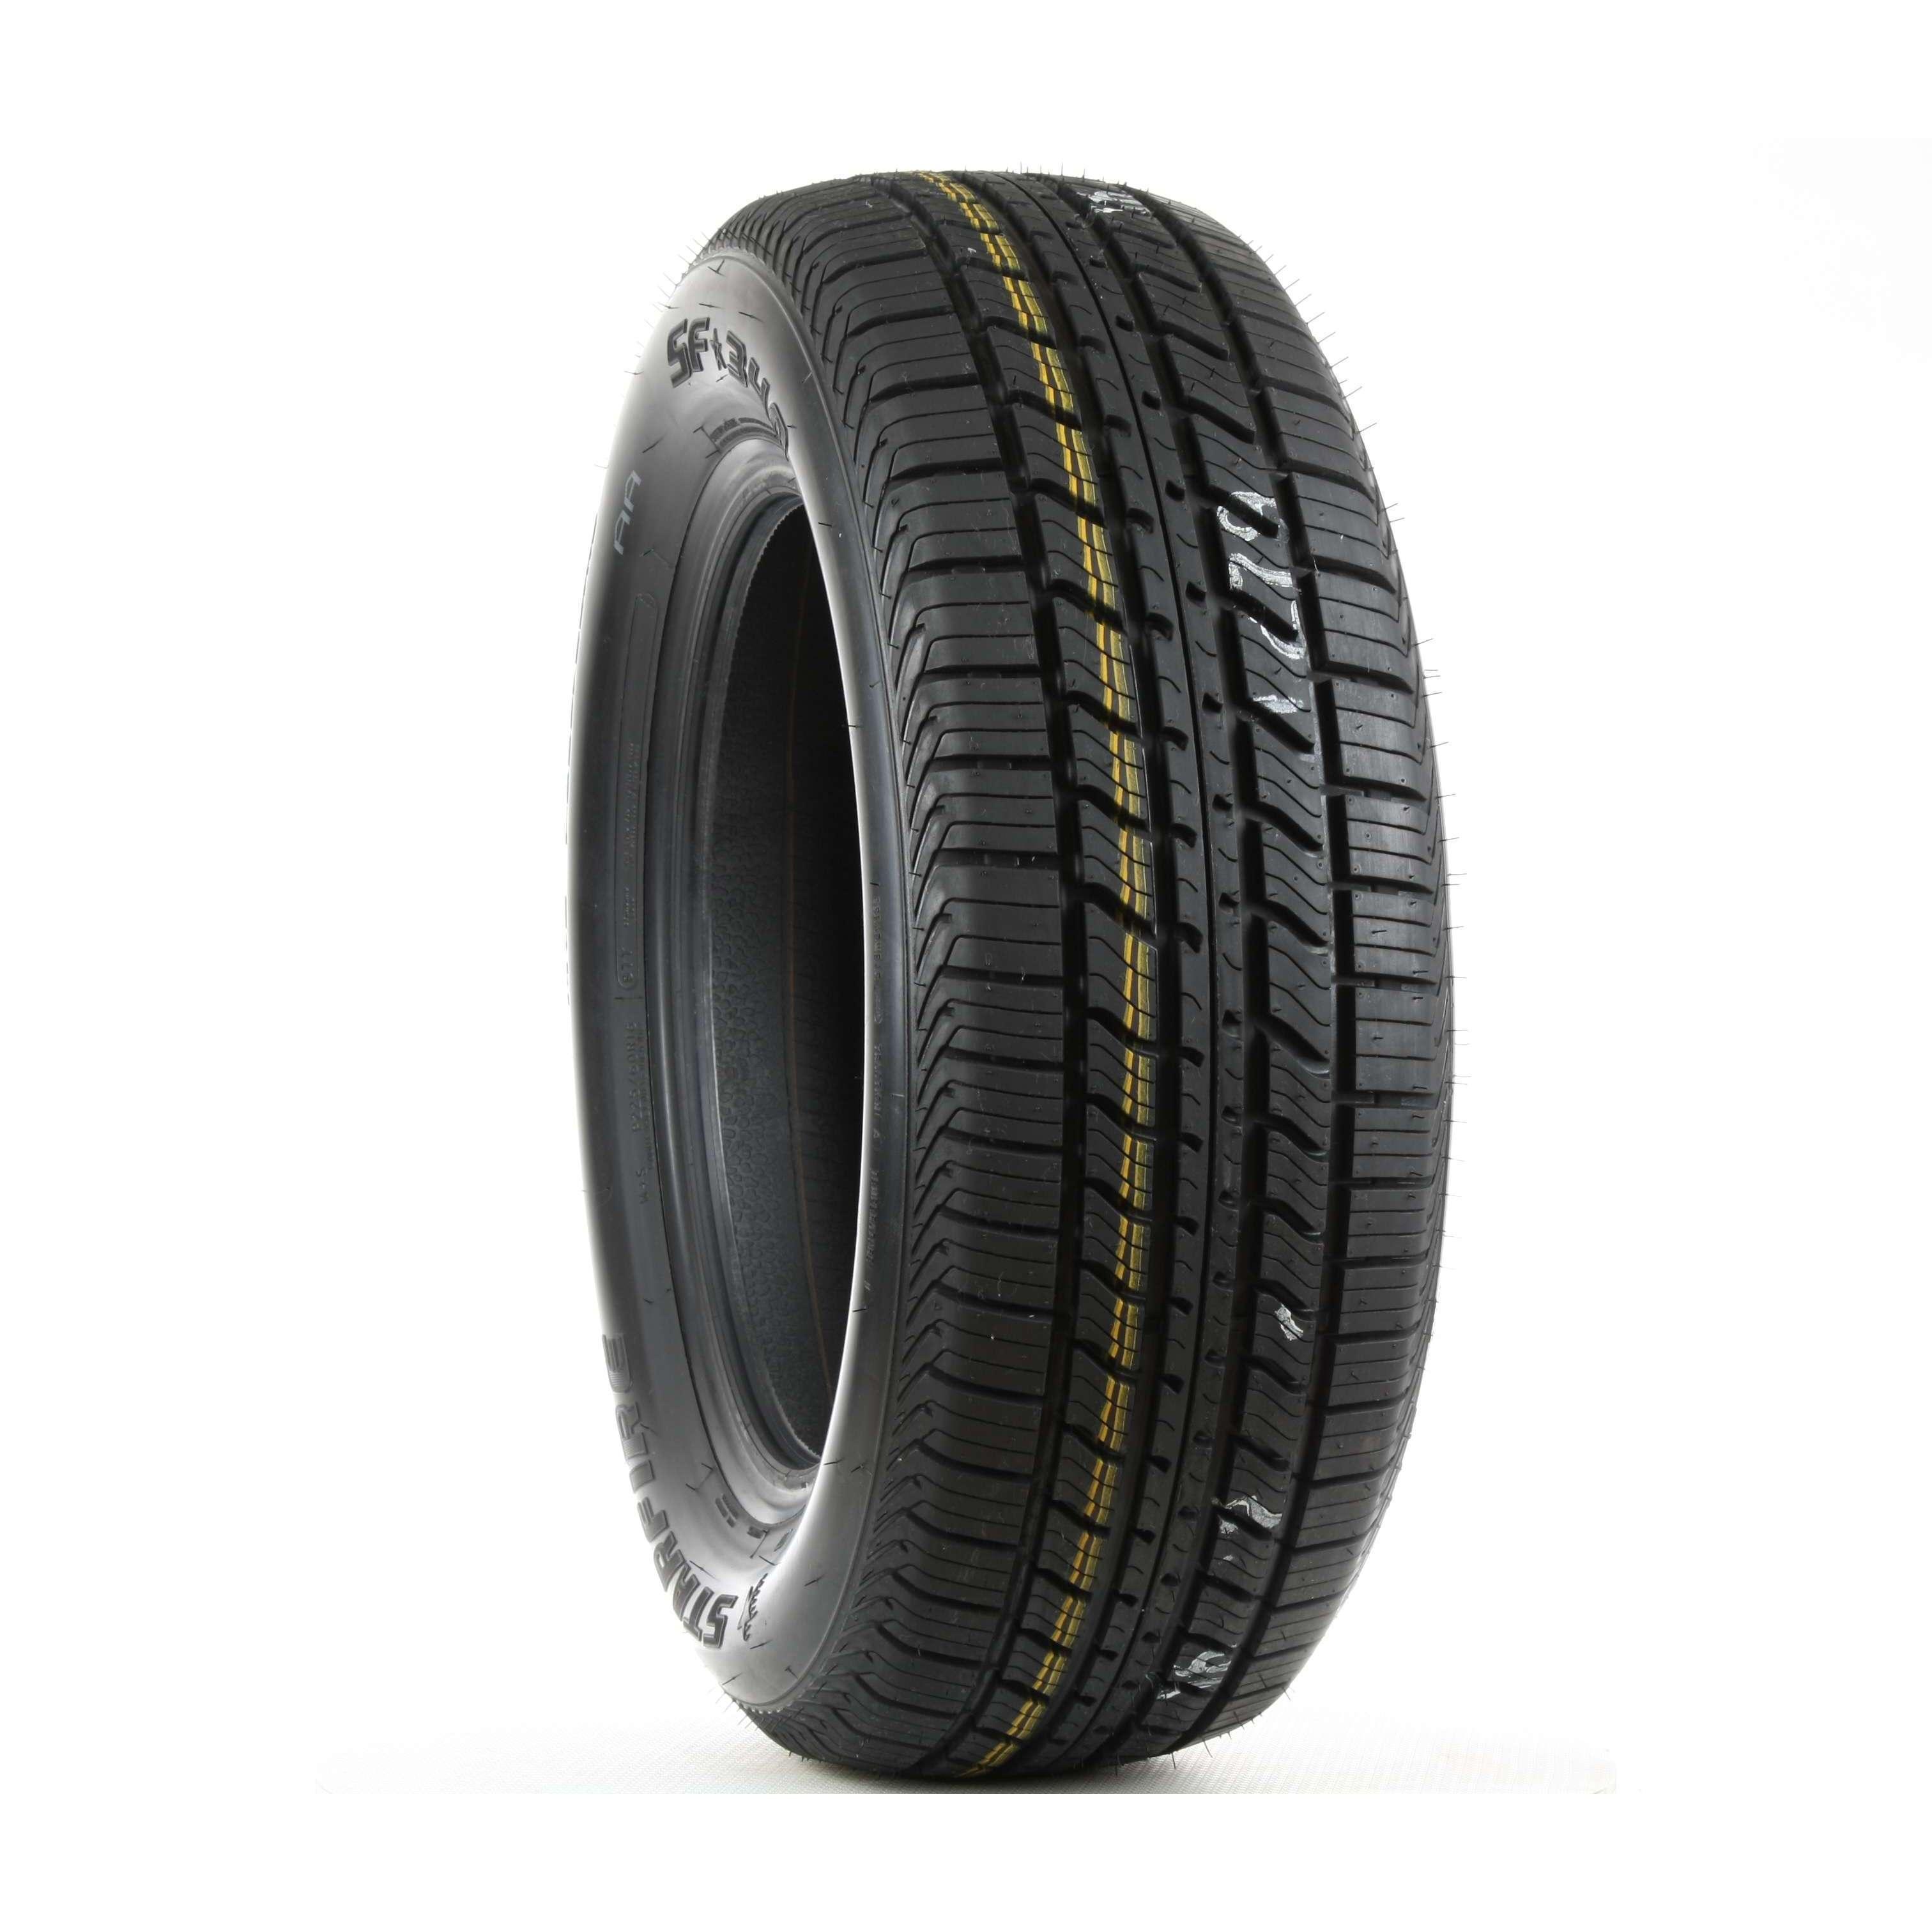 Starfire SF-340 All Season Tire - 195/60R15 87T (Black)